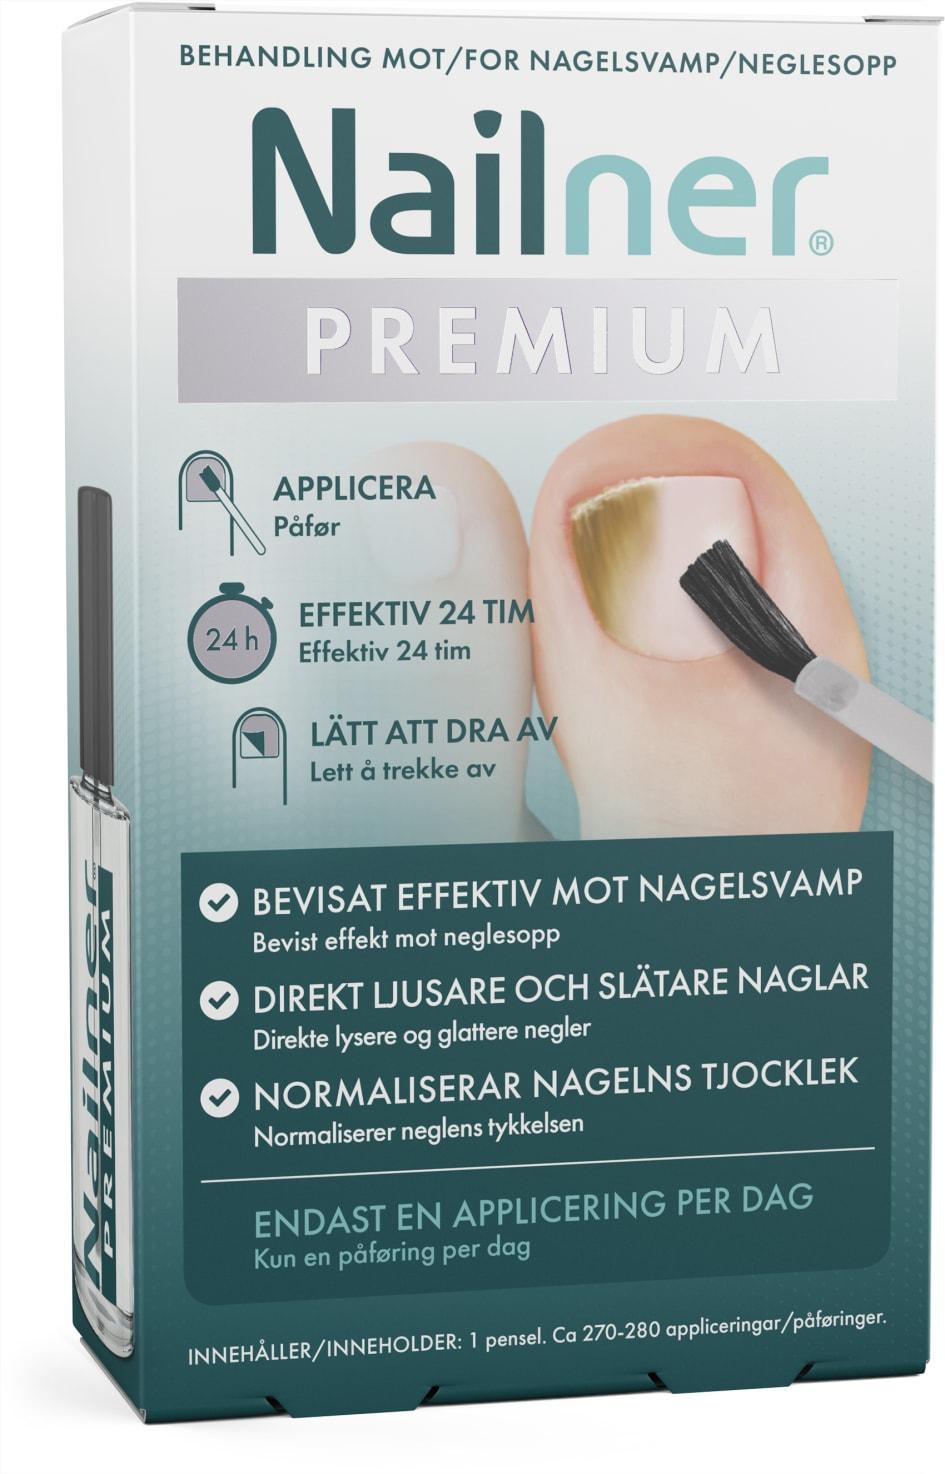 7135e680651 Nu finns en ny effektiv behandling mot nagelsvamp som ger direkt synligt  resultat. Nailner Premium erbjuder den nyaste teknologin mot nagelsvamp med  en unik ...